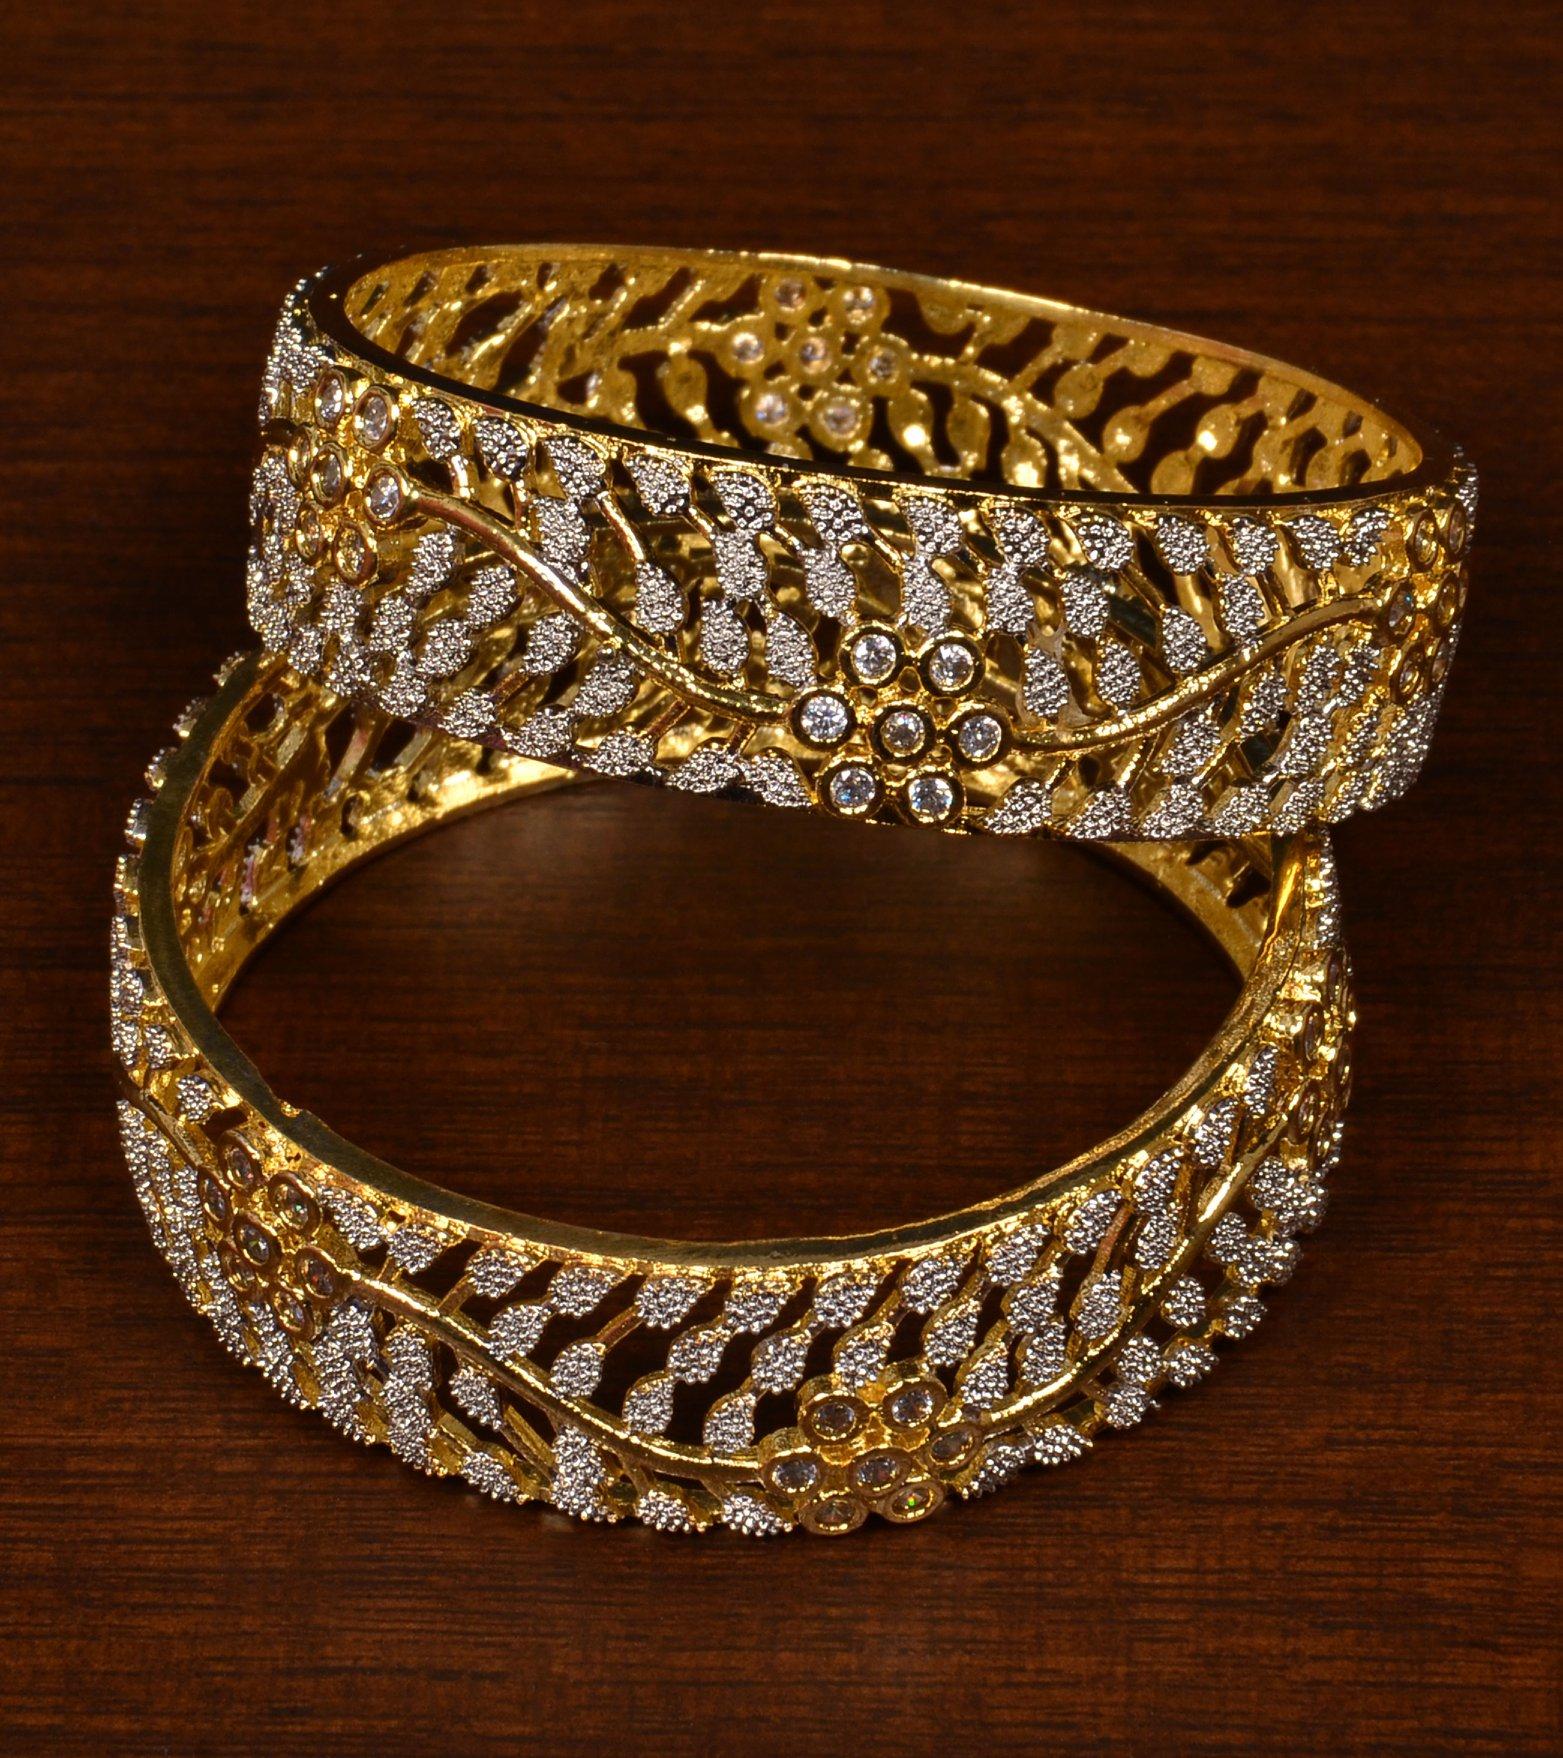 Maayra Blue Indian Festive Ring Hand Crafted Adjustable Filigree Wedding Ring